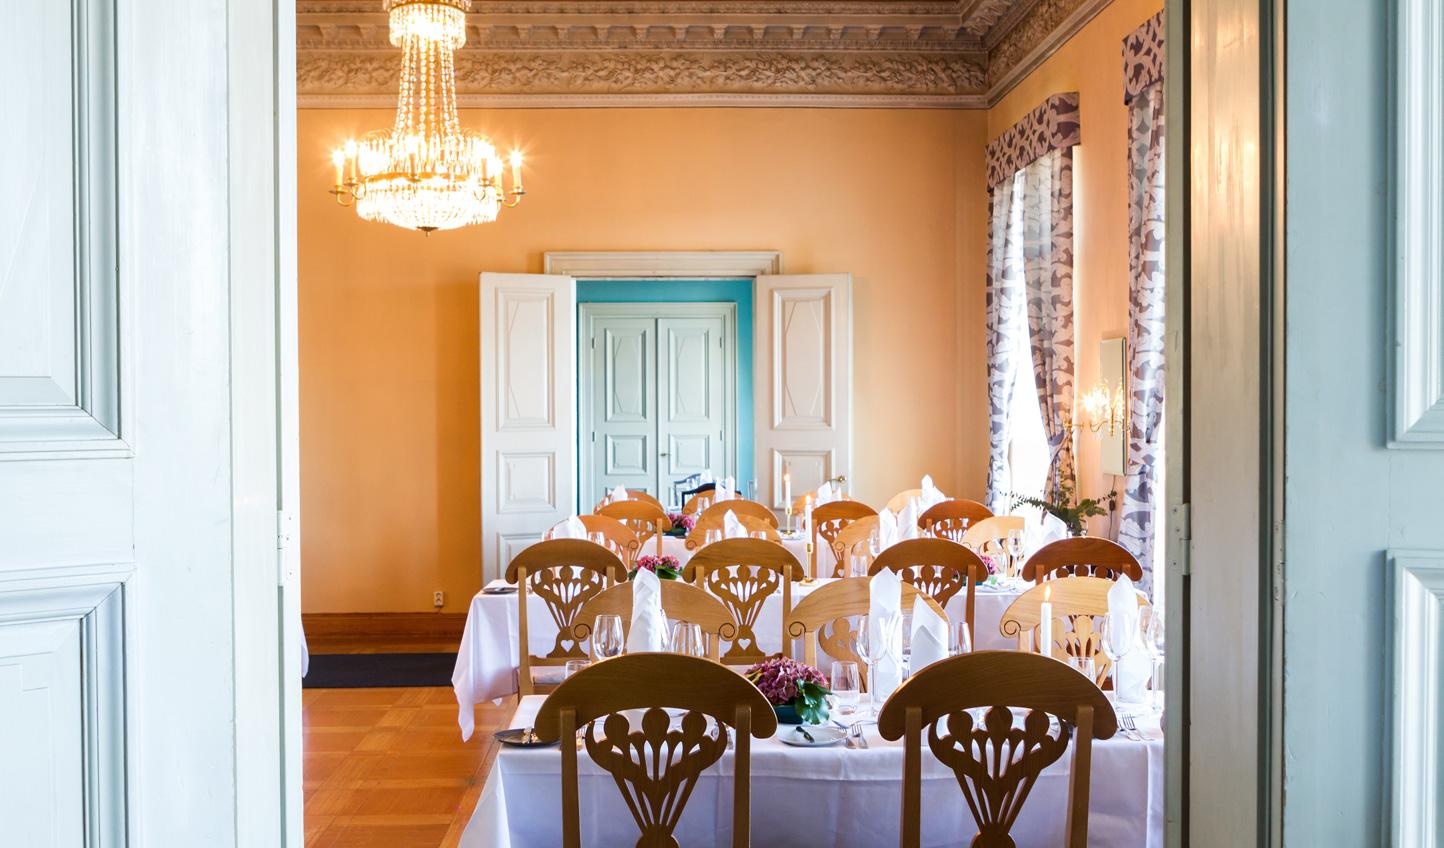 Enjoy traditional cuisine at Restaurant Haven